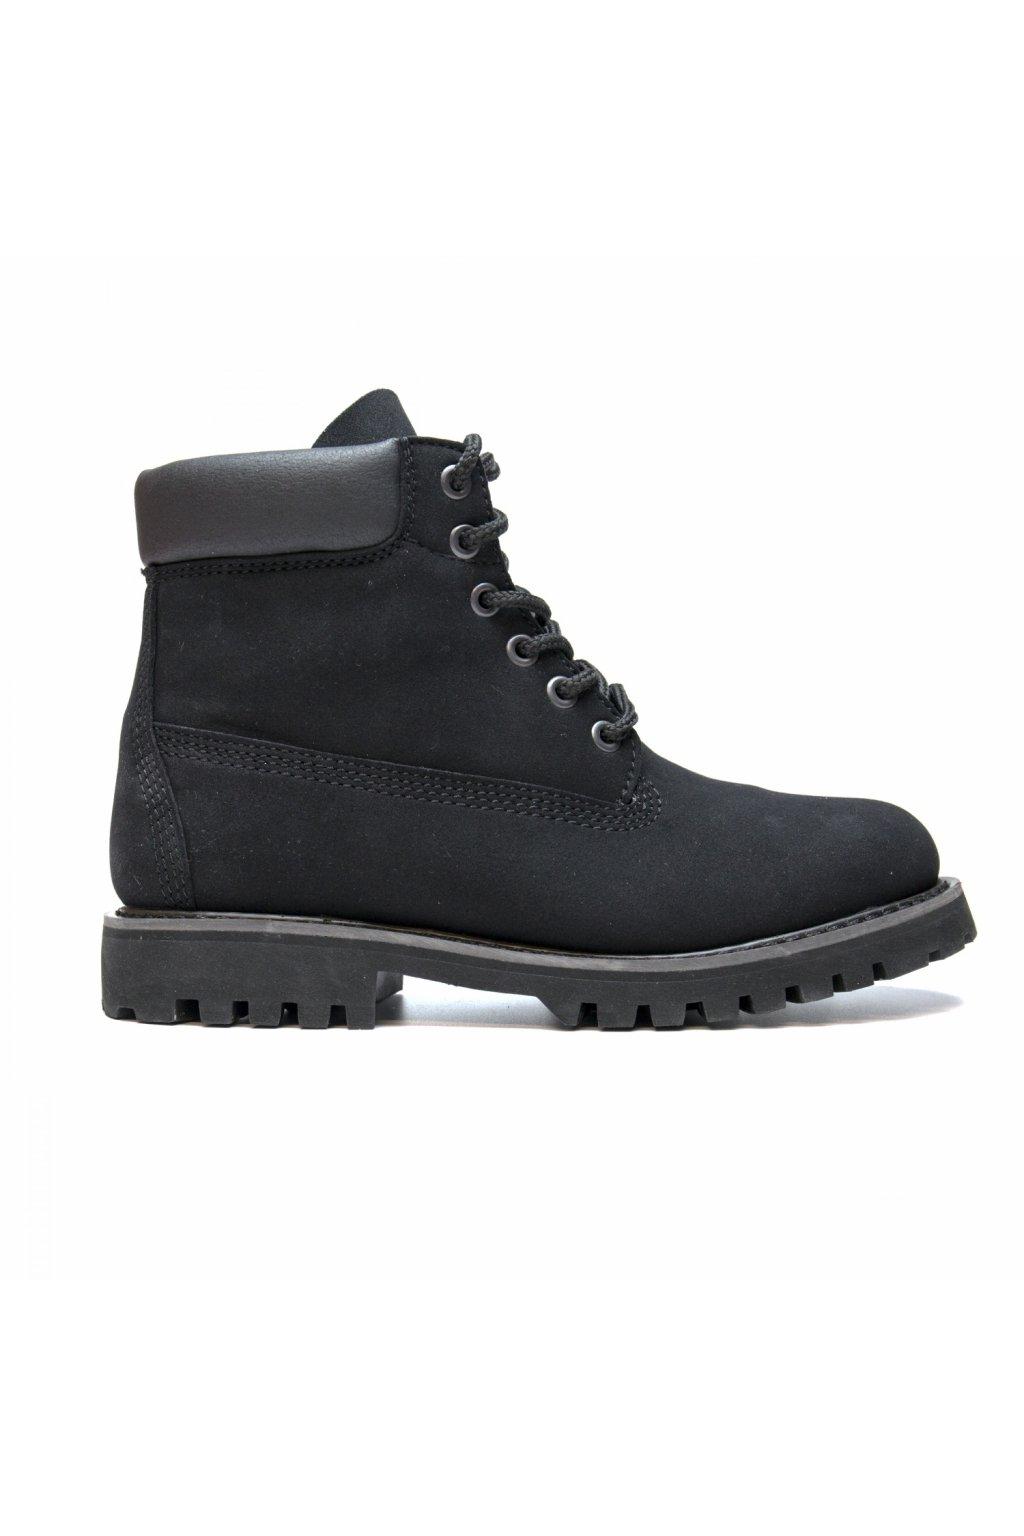 "Ručne šité čierne členkové topánky ""Etna Black"""